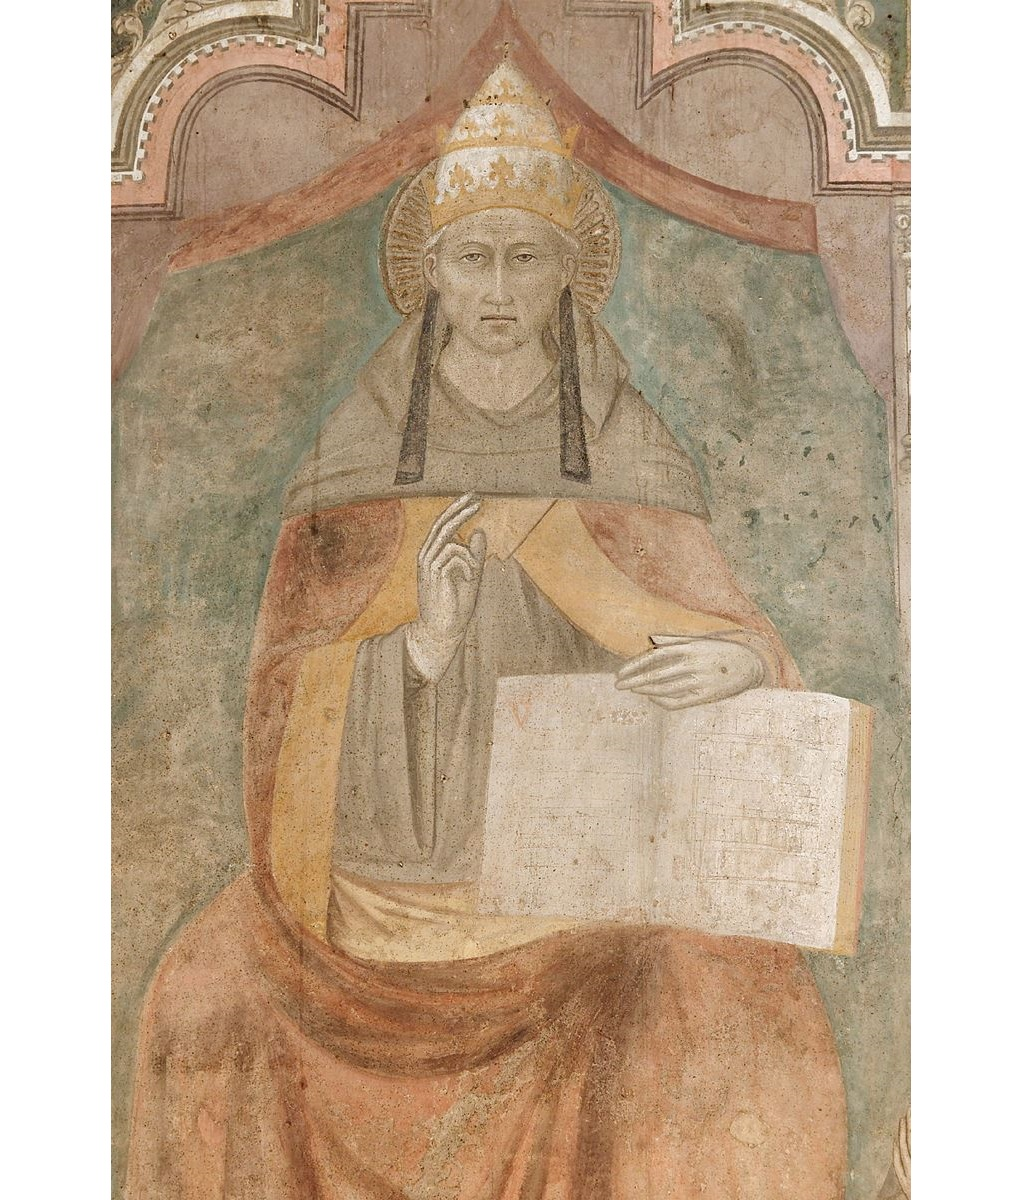 Oggi 19 maggio la Chiesa ricorda San Celestino V foto